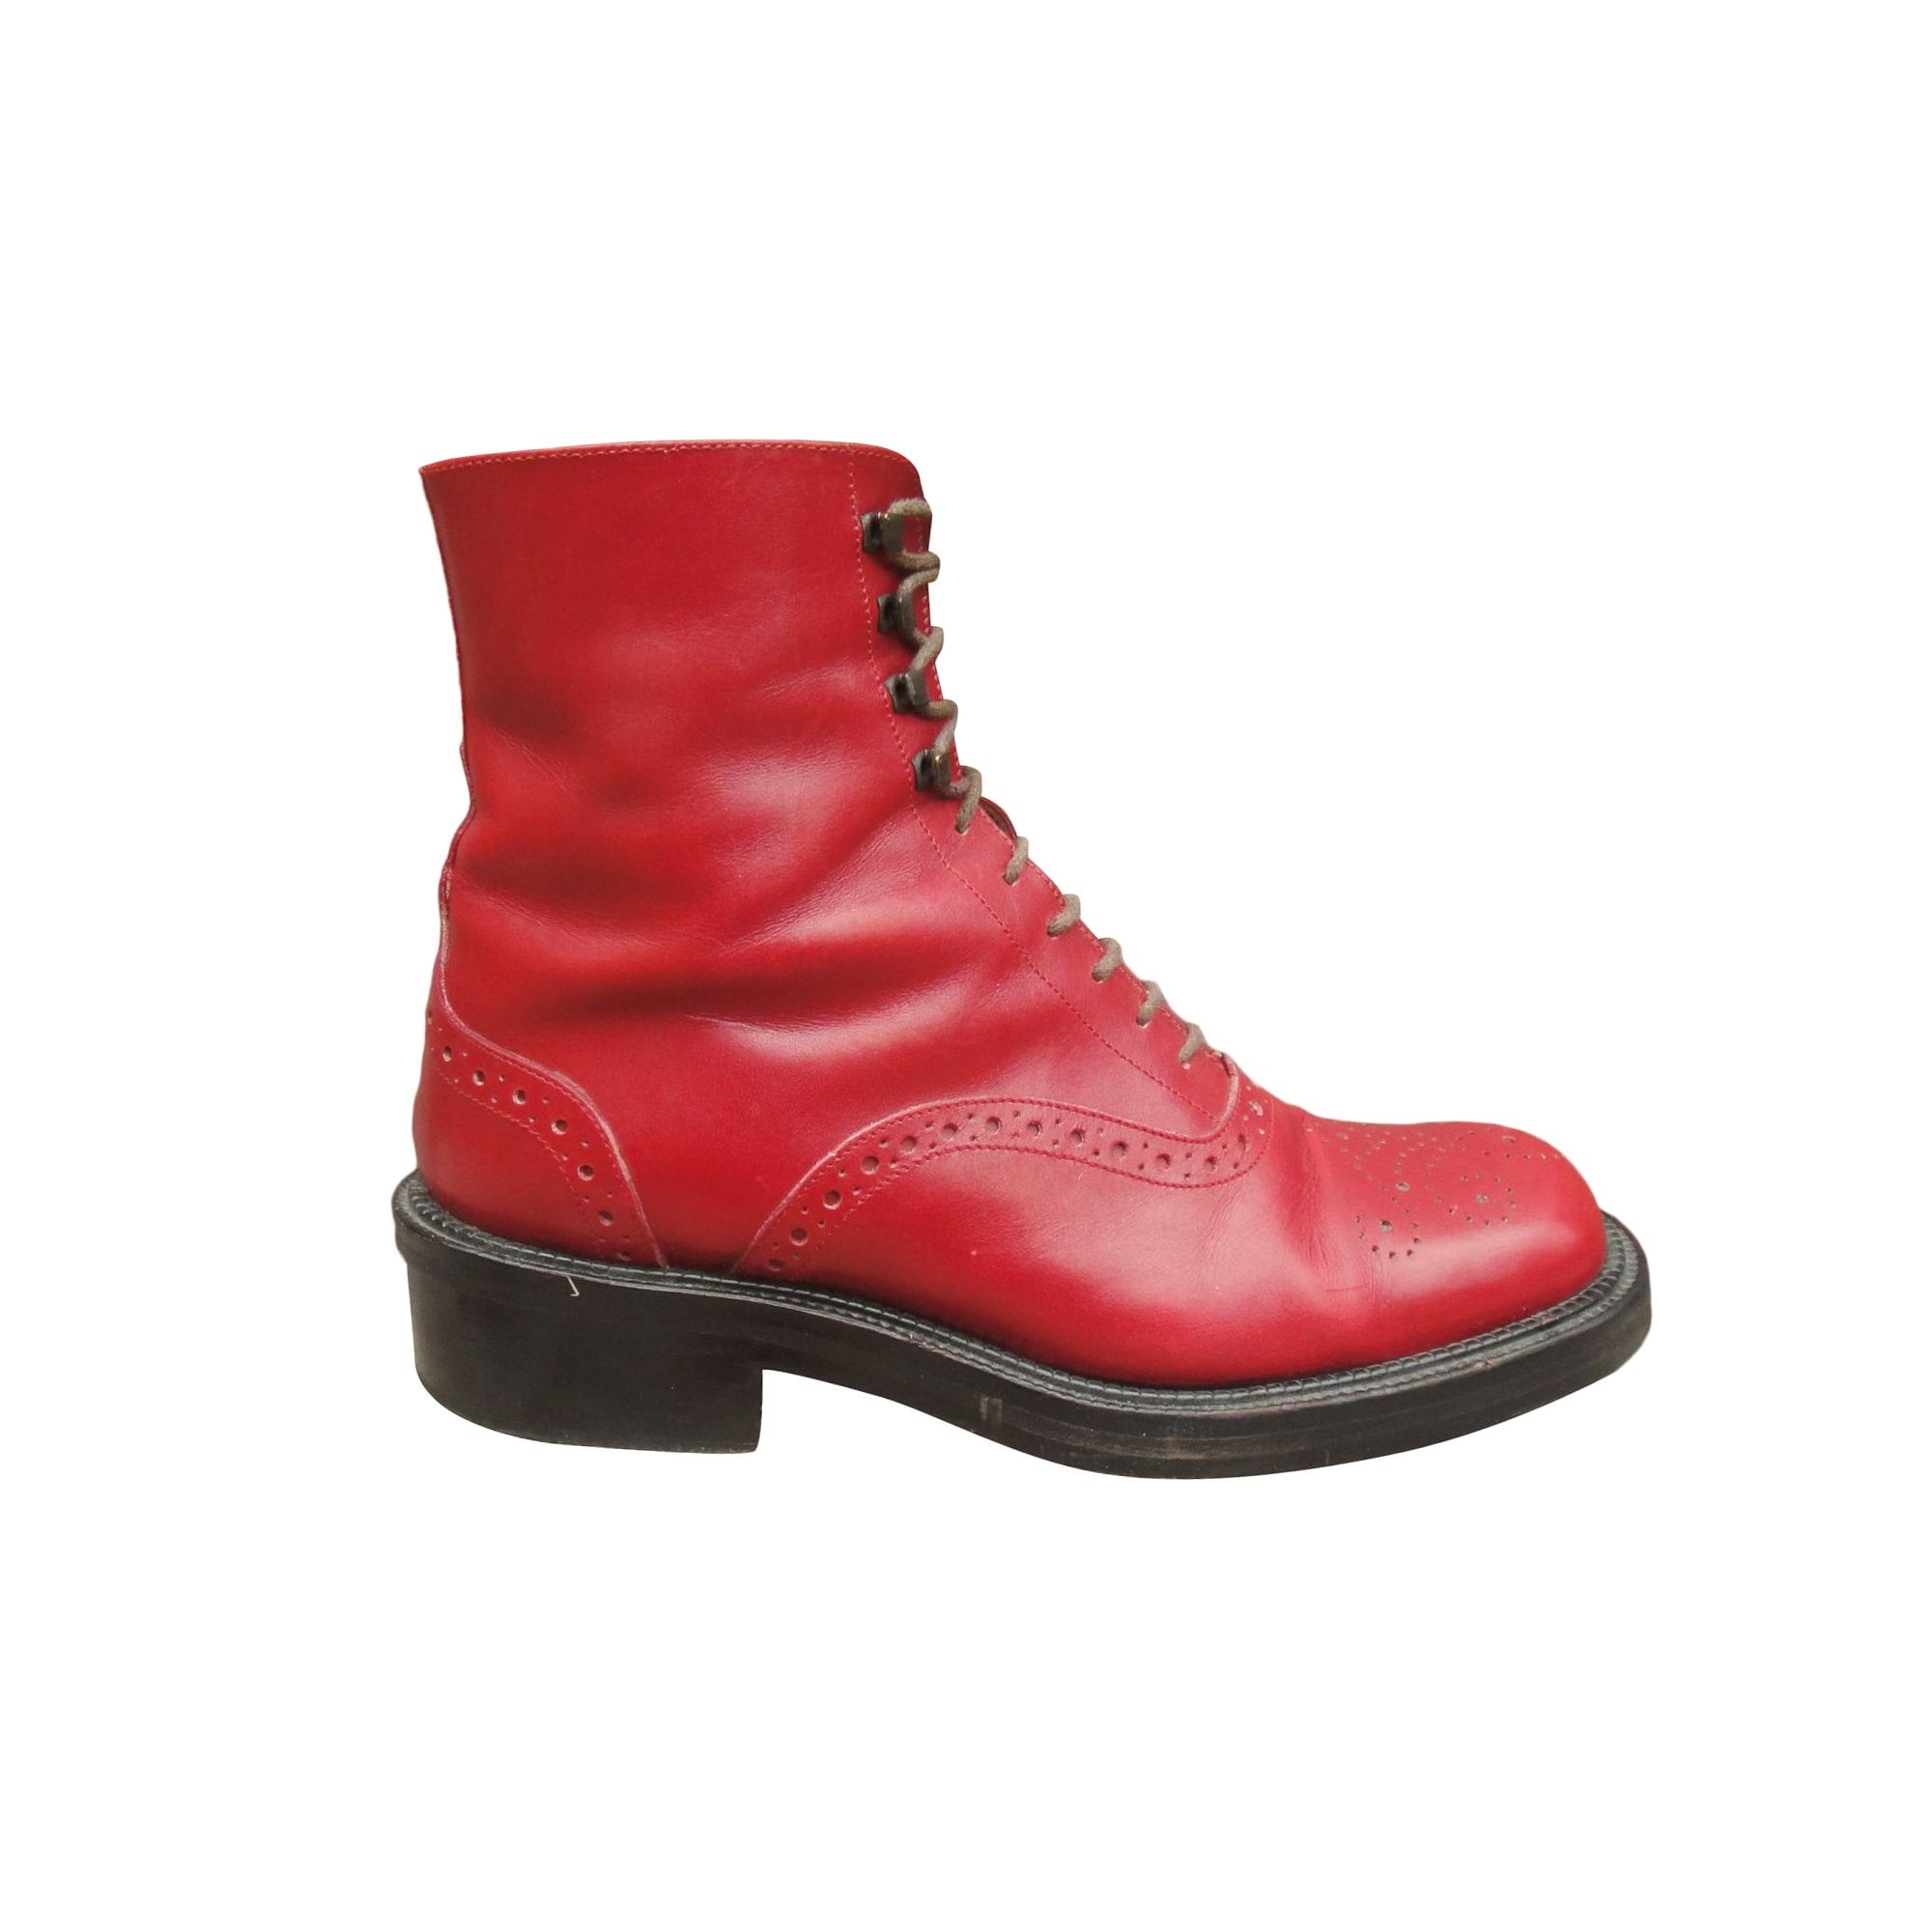 Biker Ankle Boots SARTORE Red, burgundy